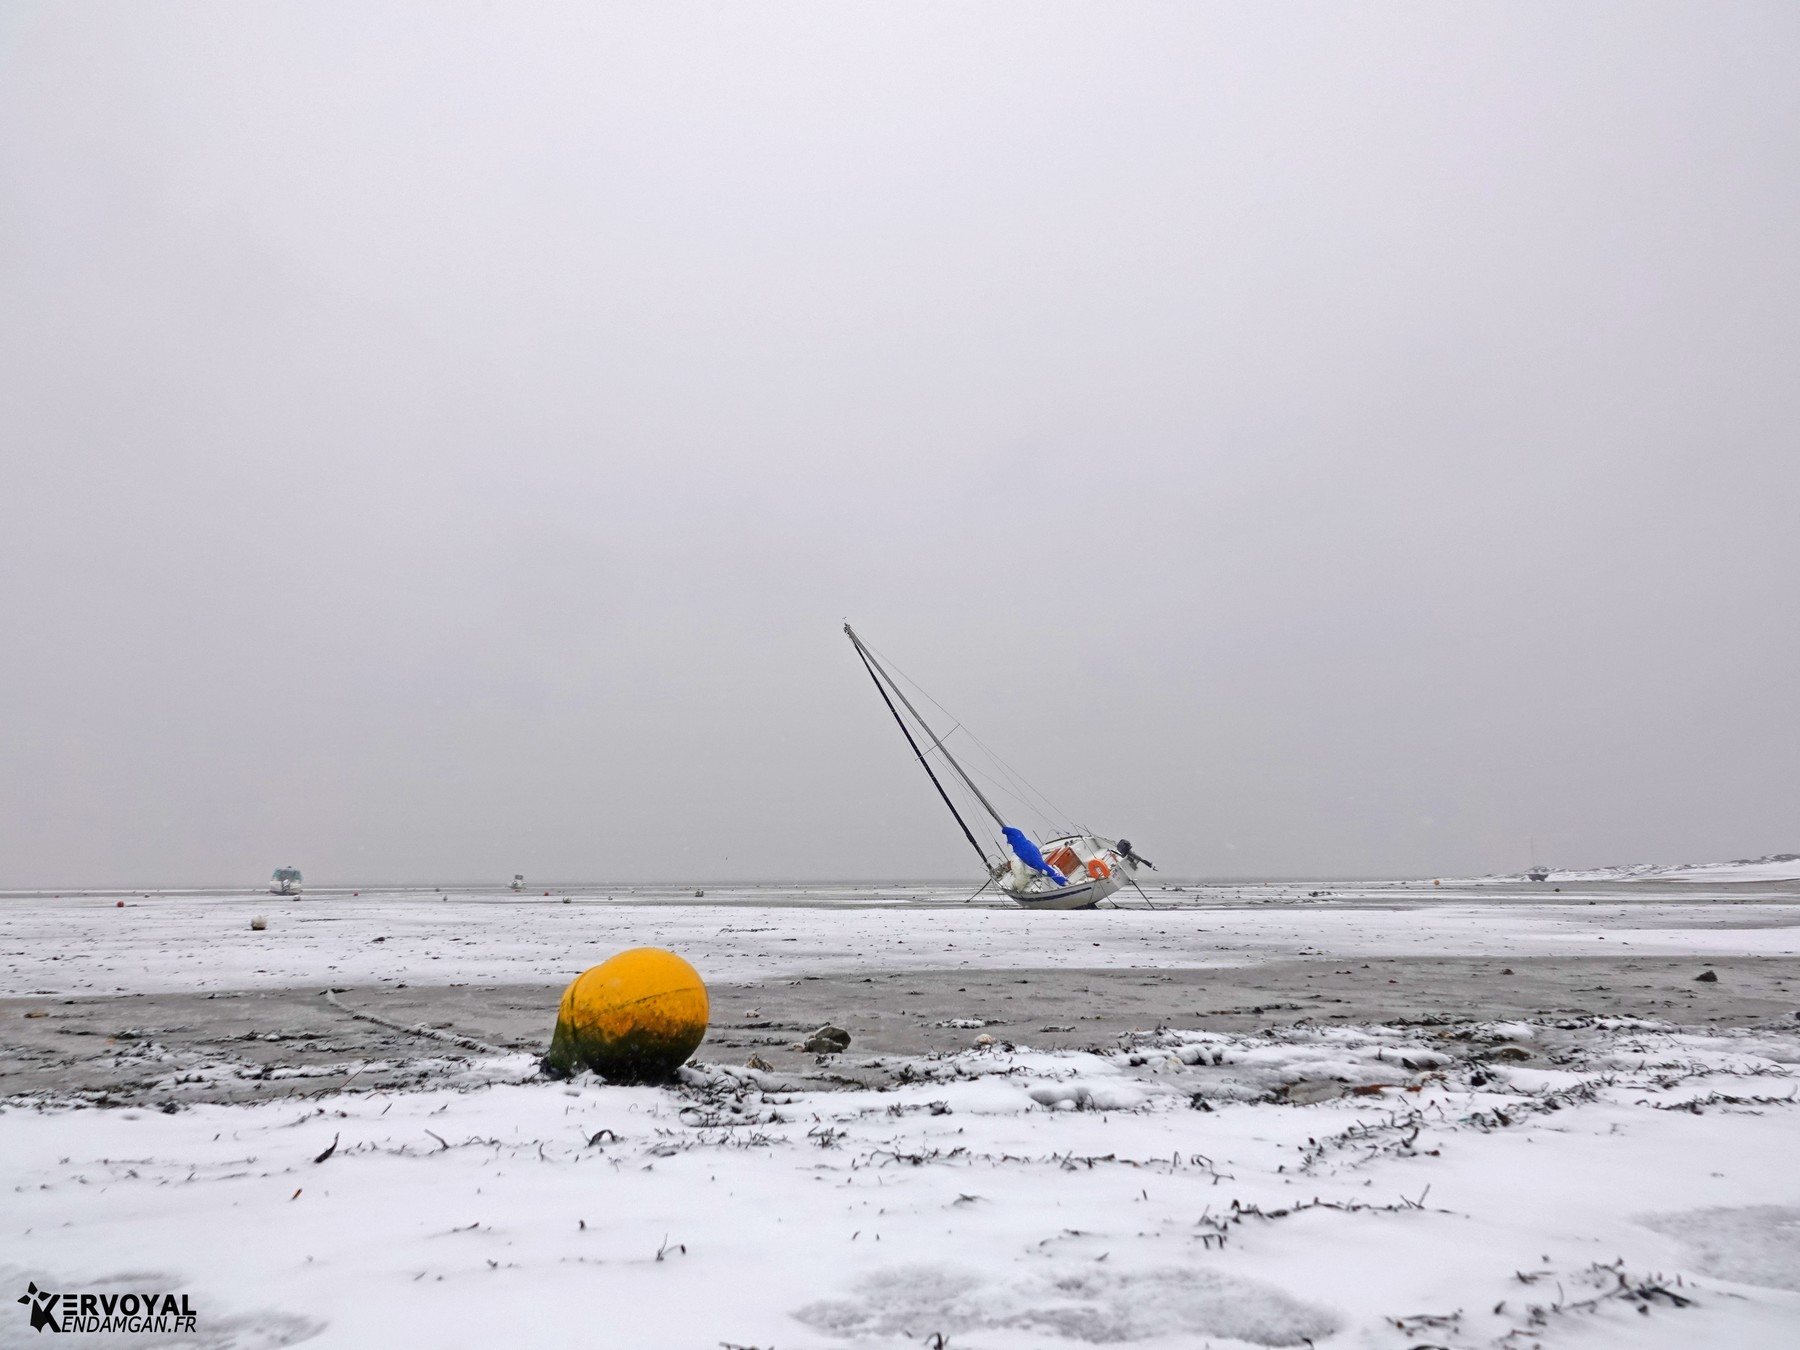 neige à kervoyal 11 février 2021 damgan morbihan (37)